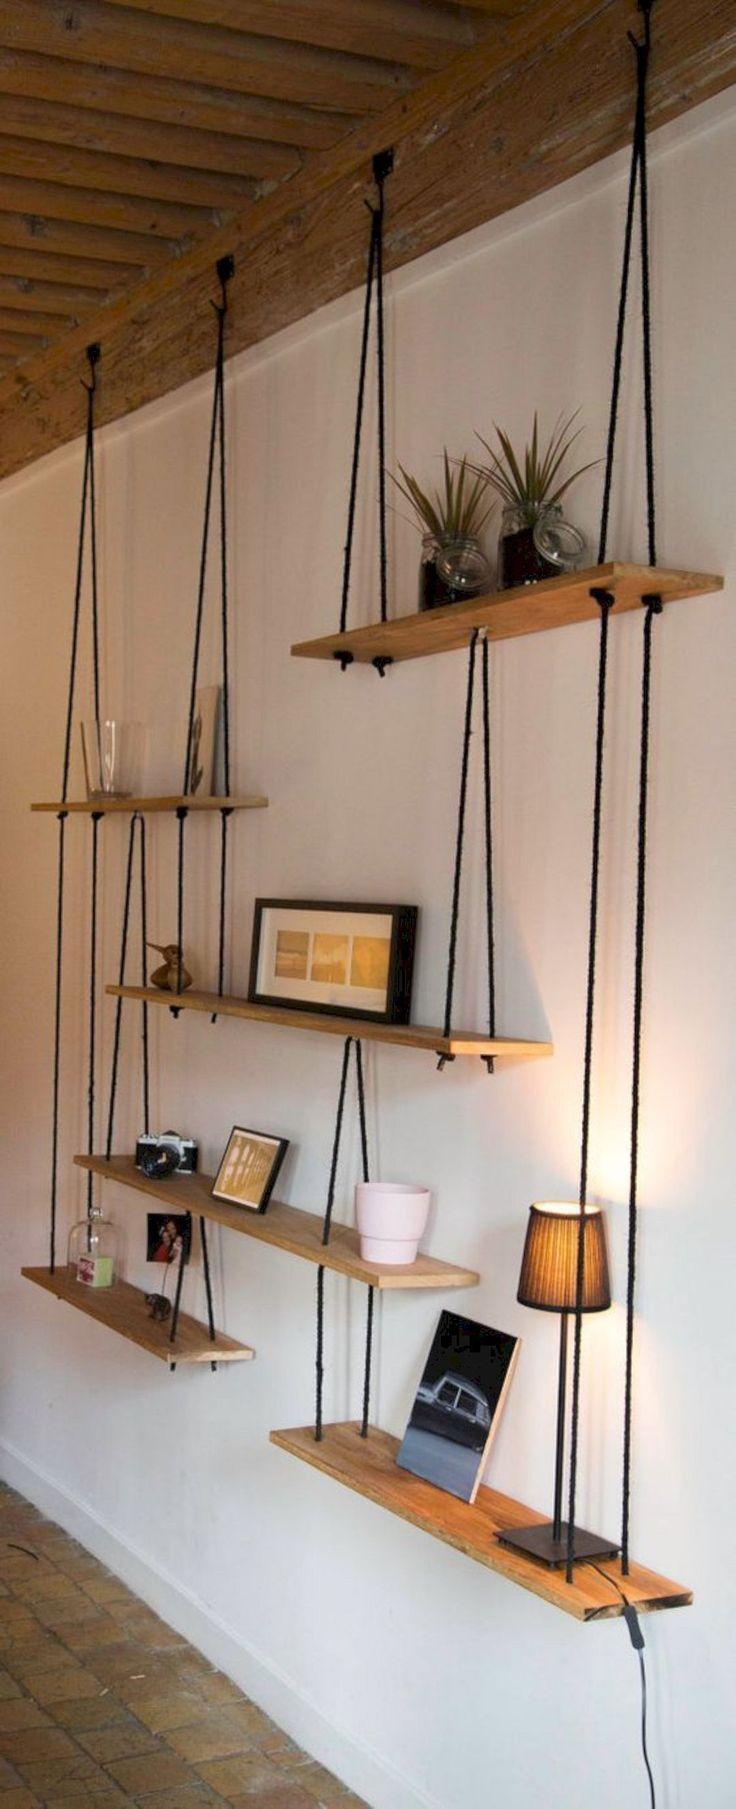 Cool DIY Home Decor Idea 7 #homedecordiybedroom #CheapHomeDécor, #DiyHomeDécor,